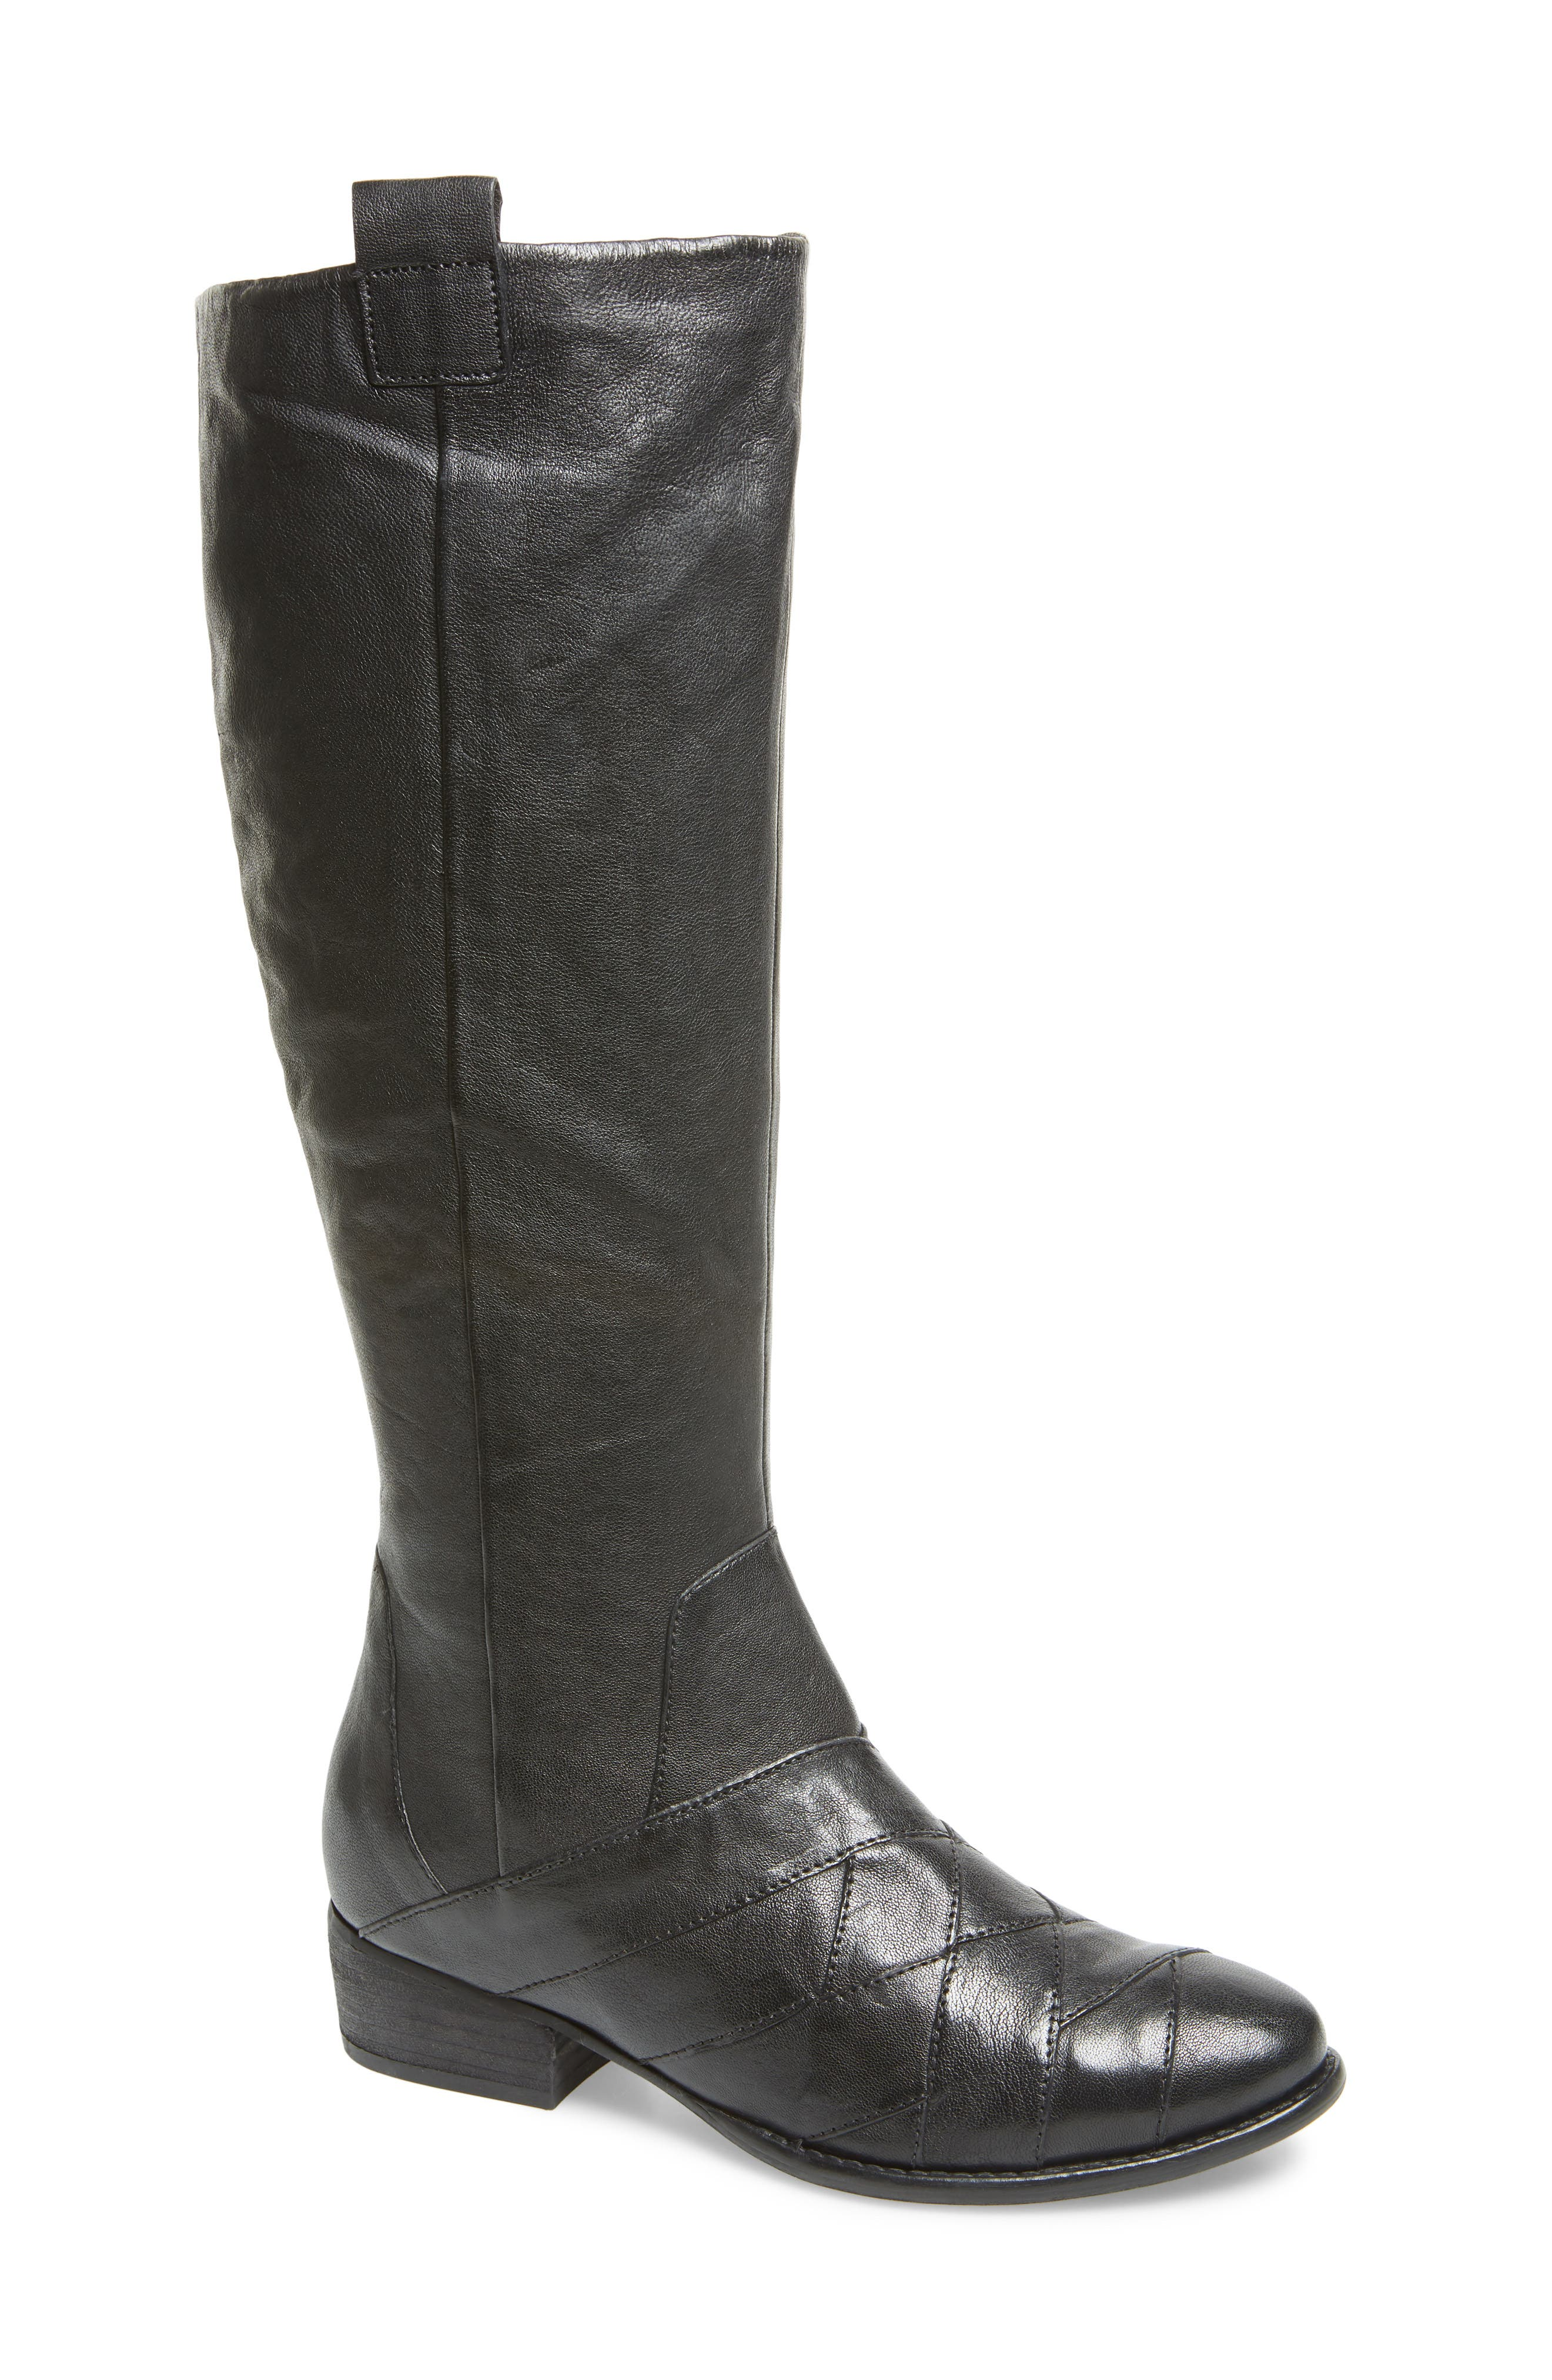 Seychelles Rally Knee High Boot- Black